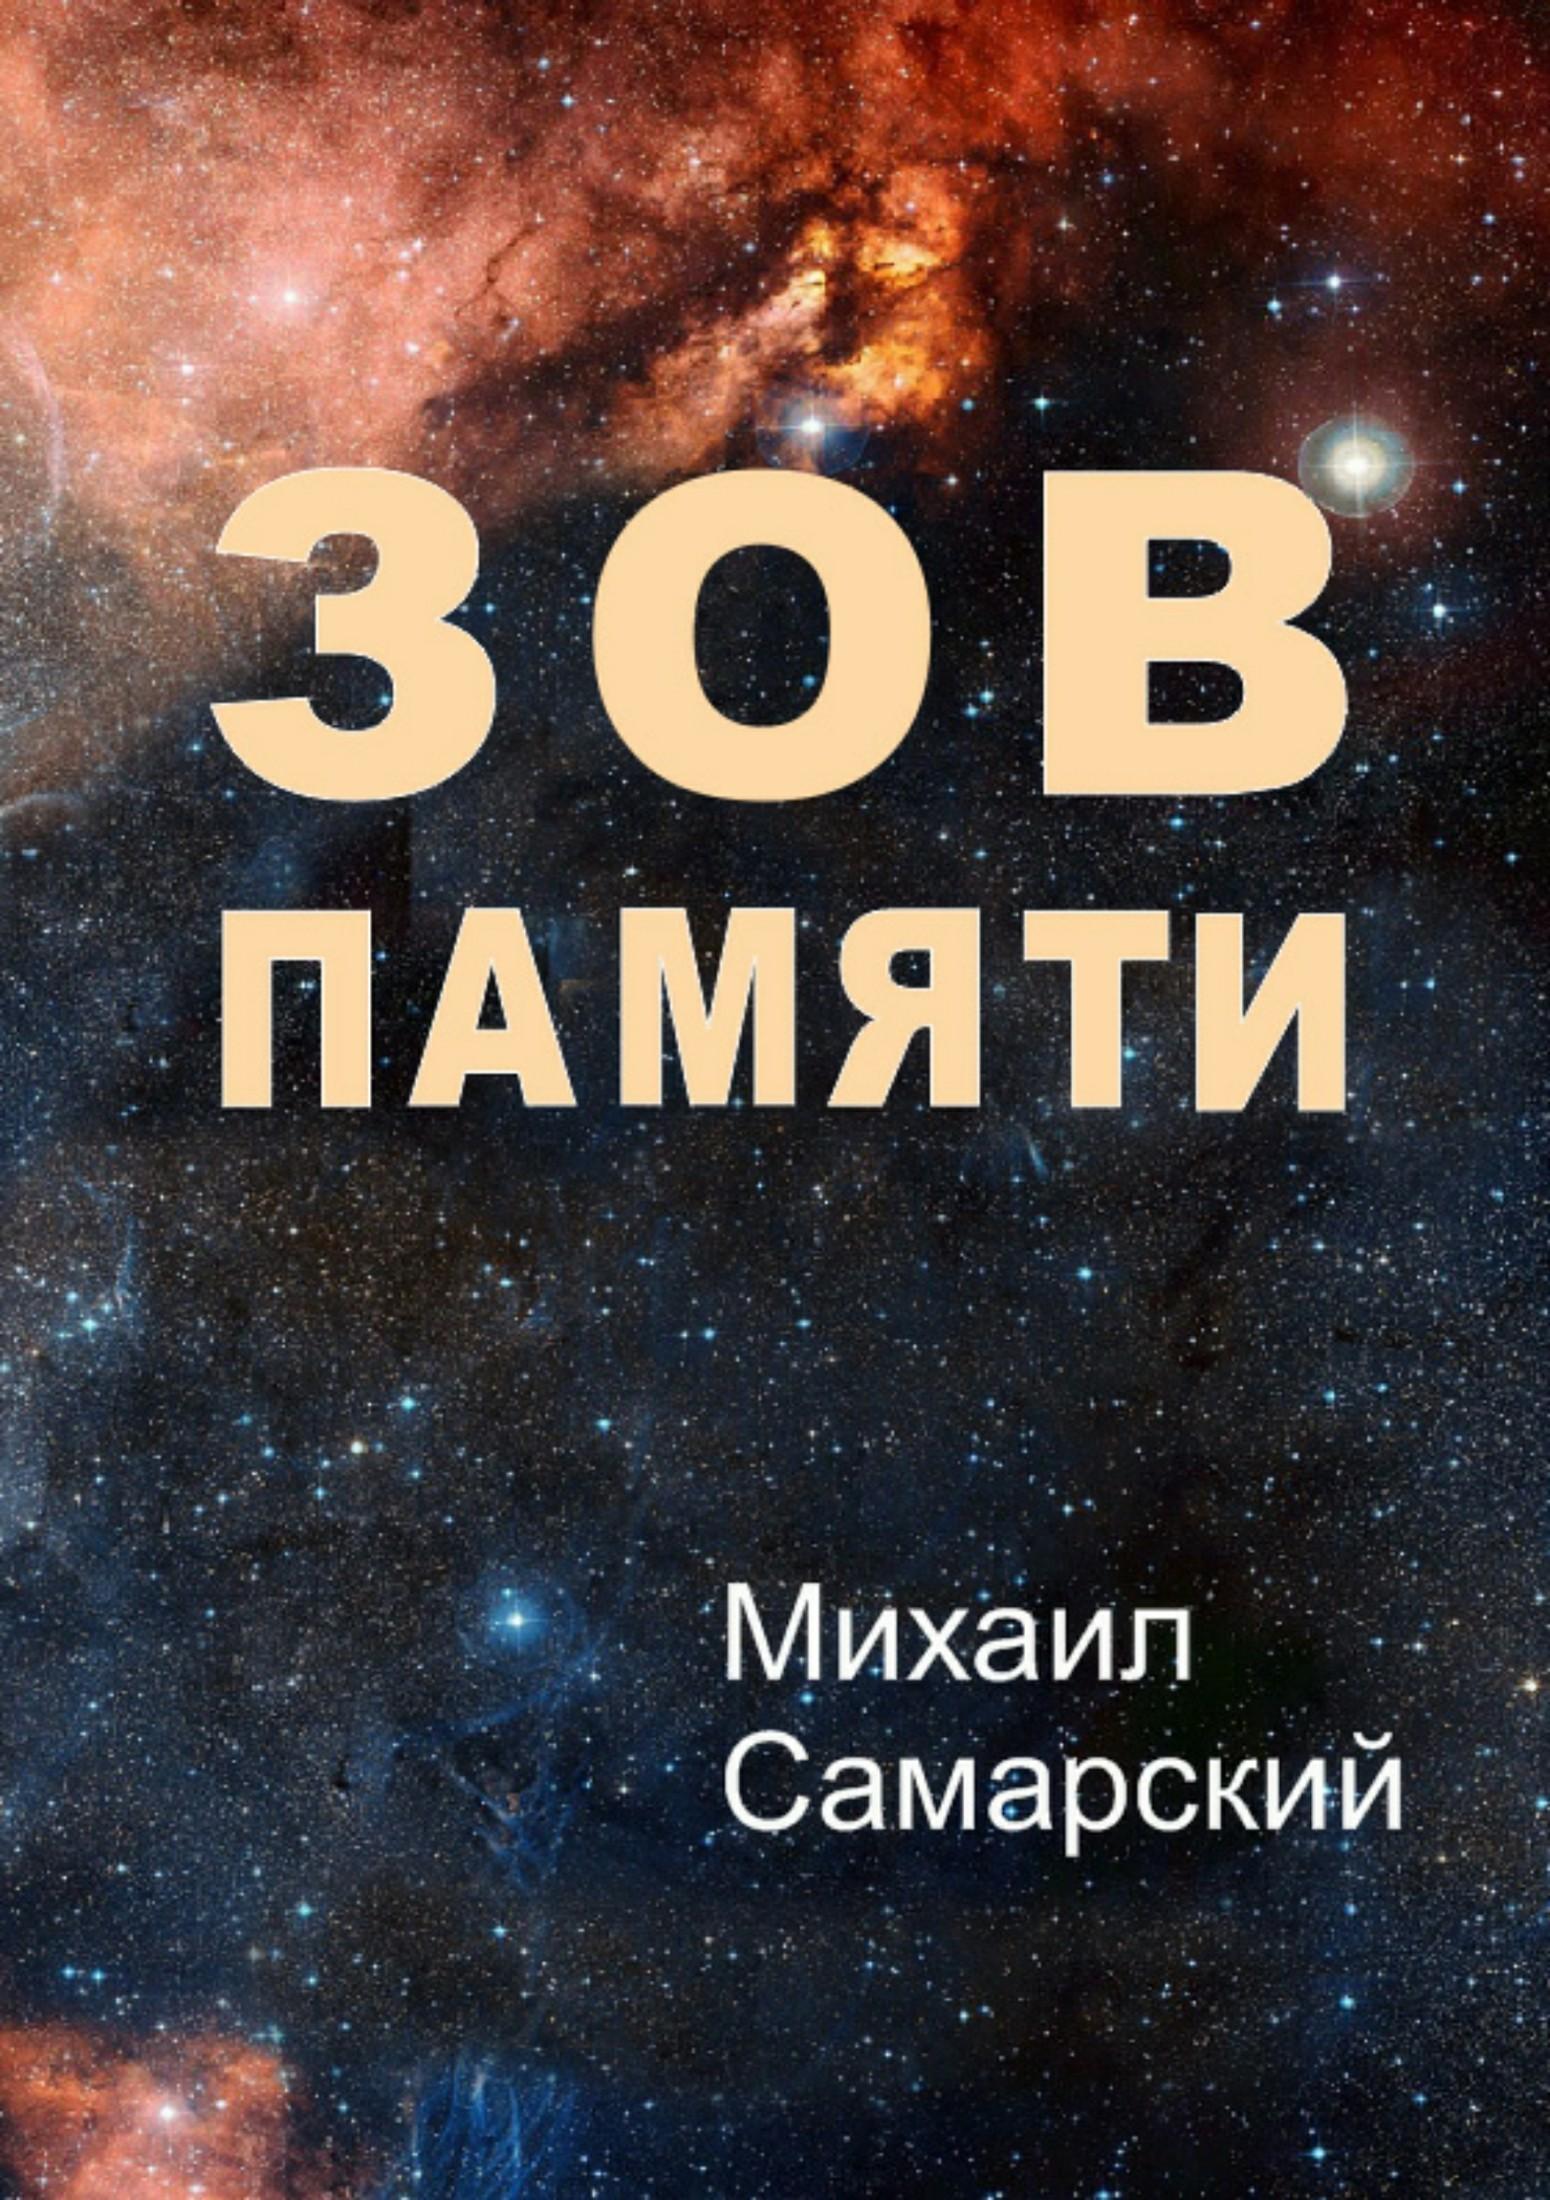 Михаил Александрович Самарский. Зов памяти